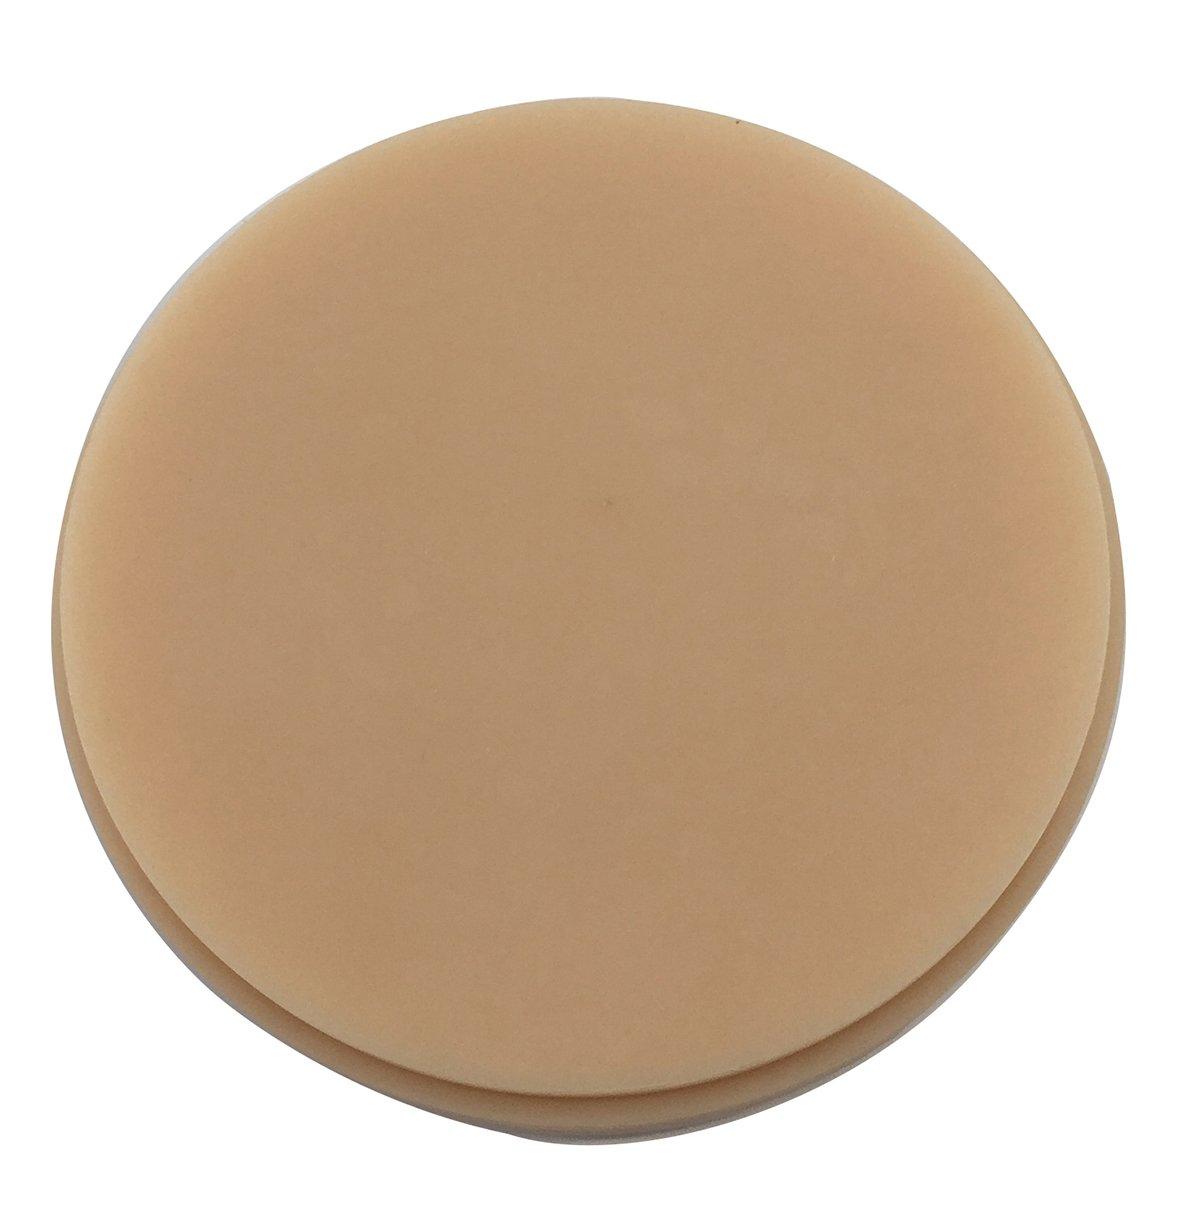 TJIRIS Wax Discs Dental CAD/CAM Machinable Carvings Blocks Miling Disks Dental Laboratory Materials 10 Pieces